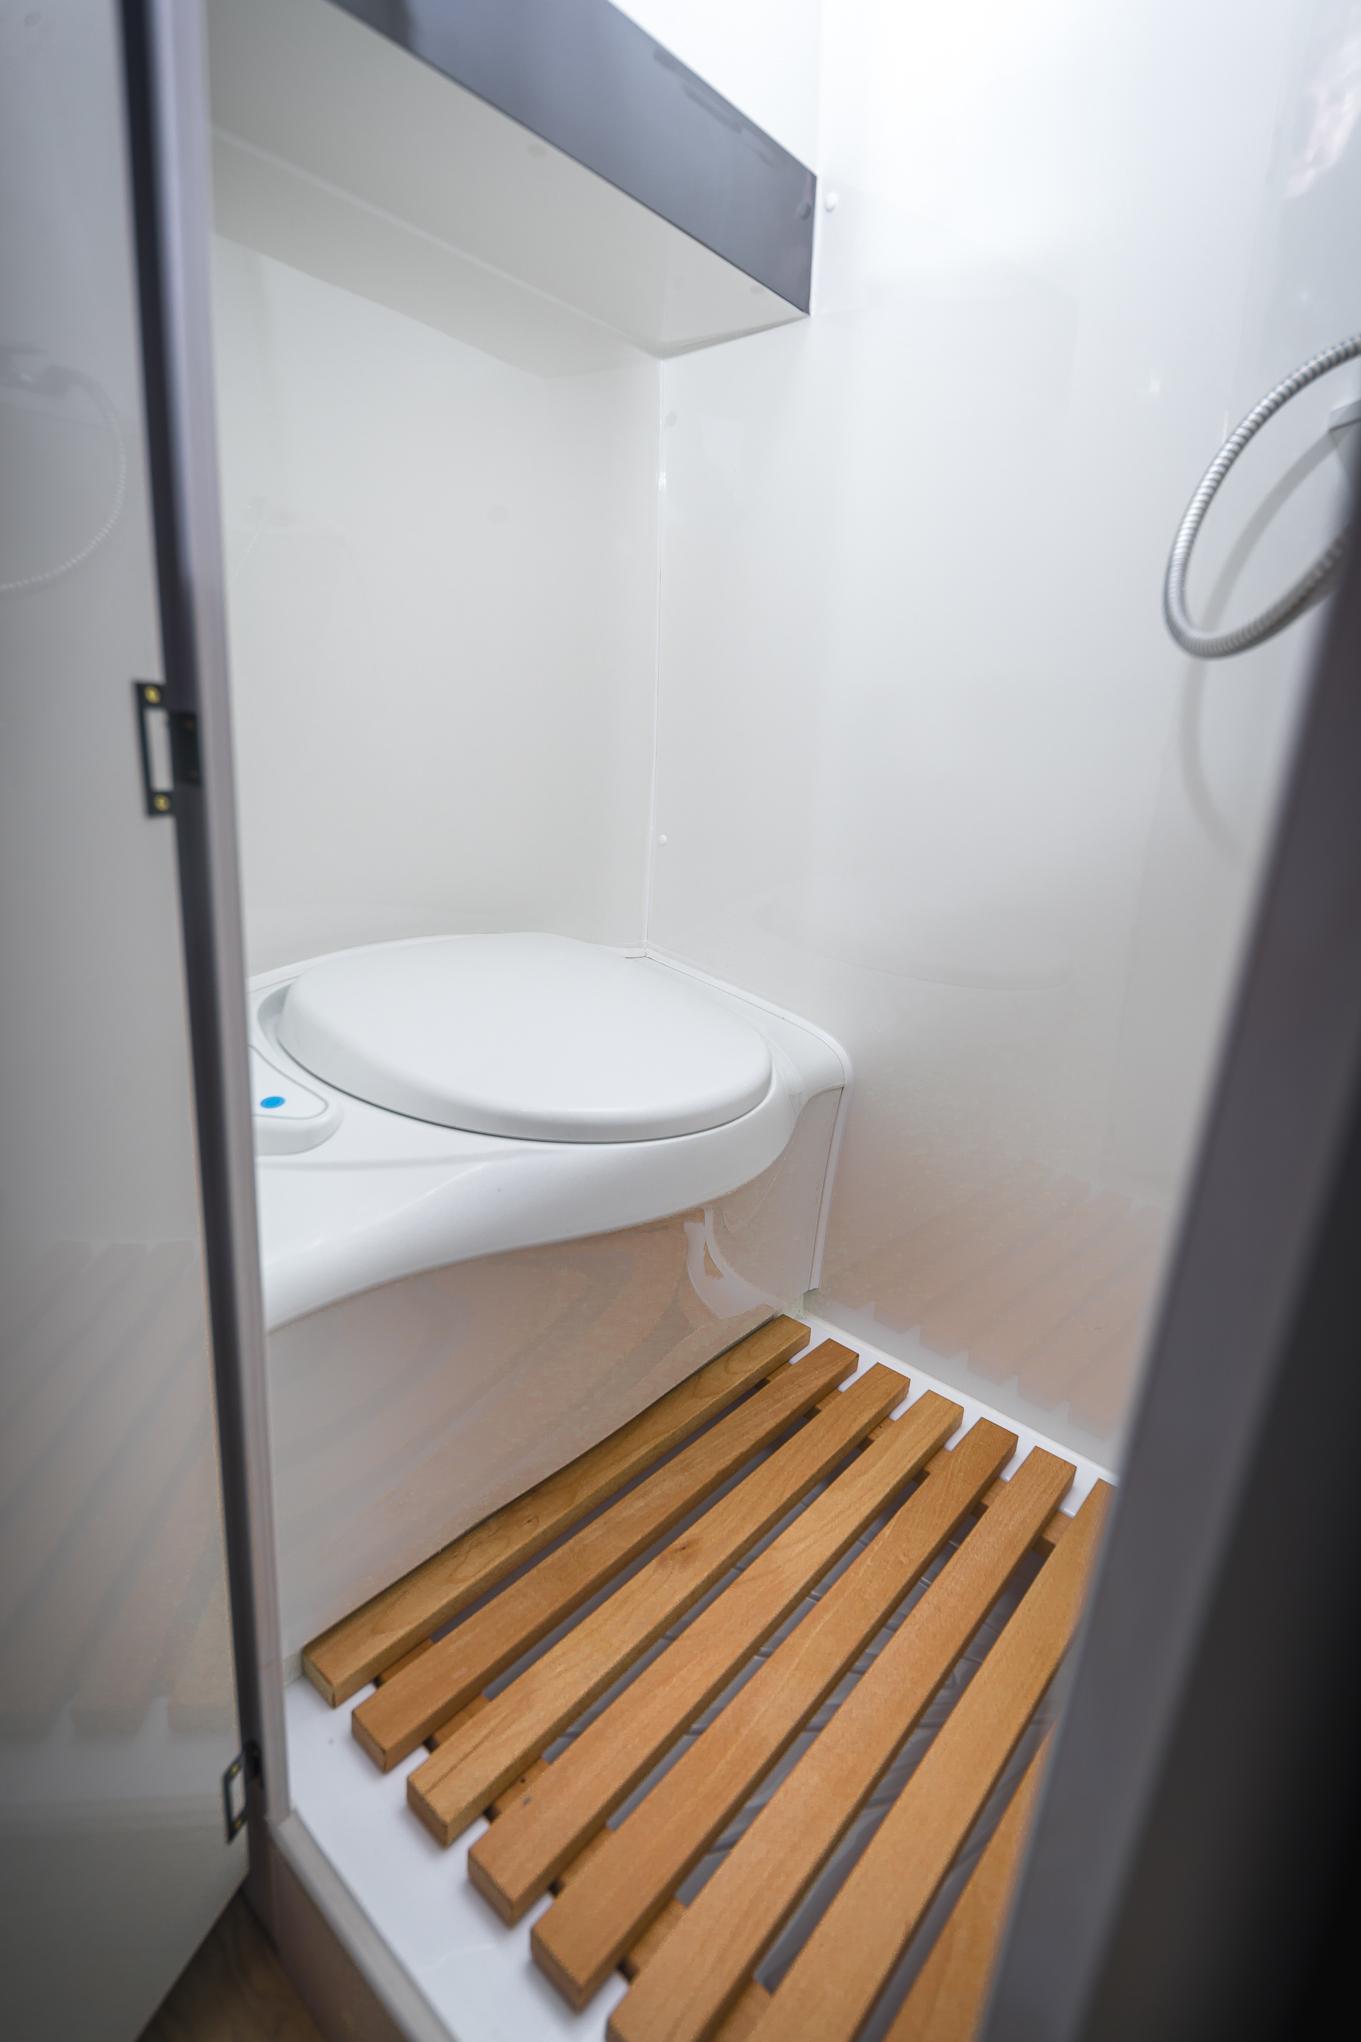 campingdusche wc im camper wohnmobil toilettenbank